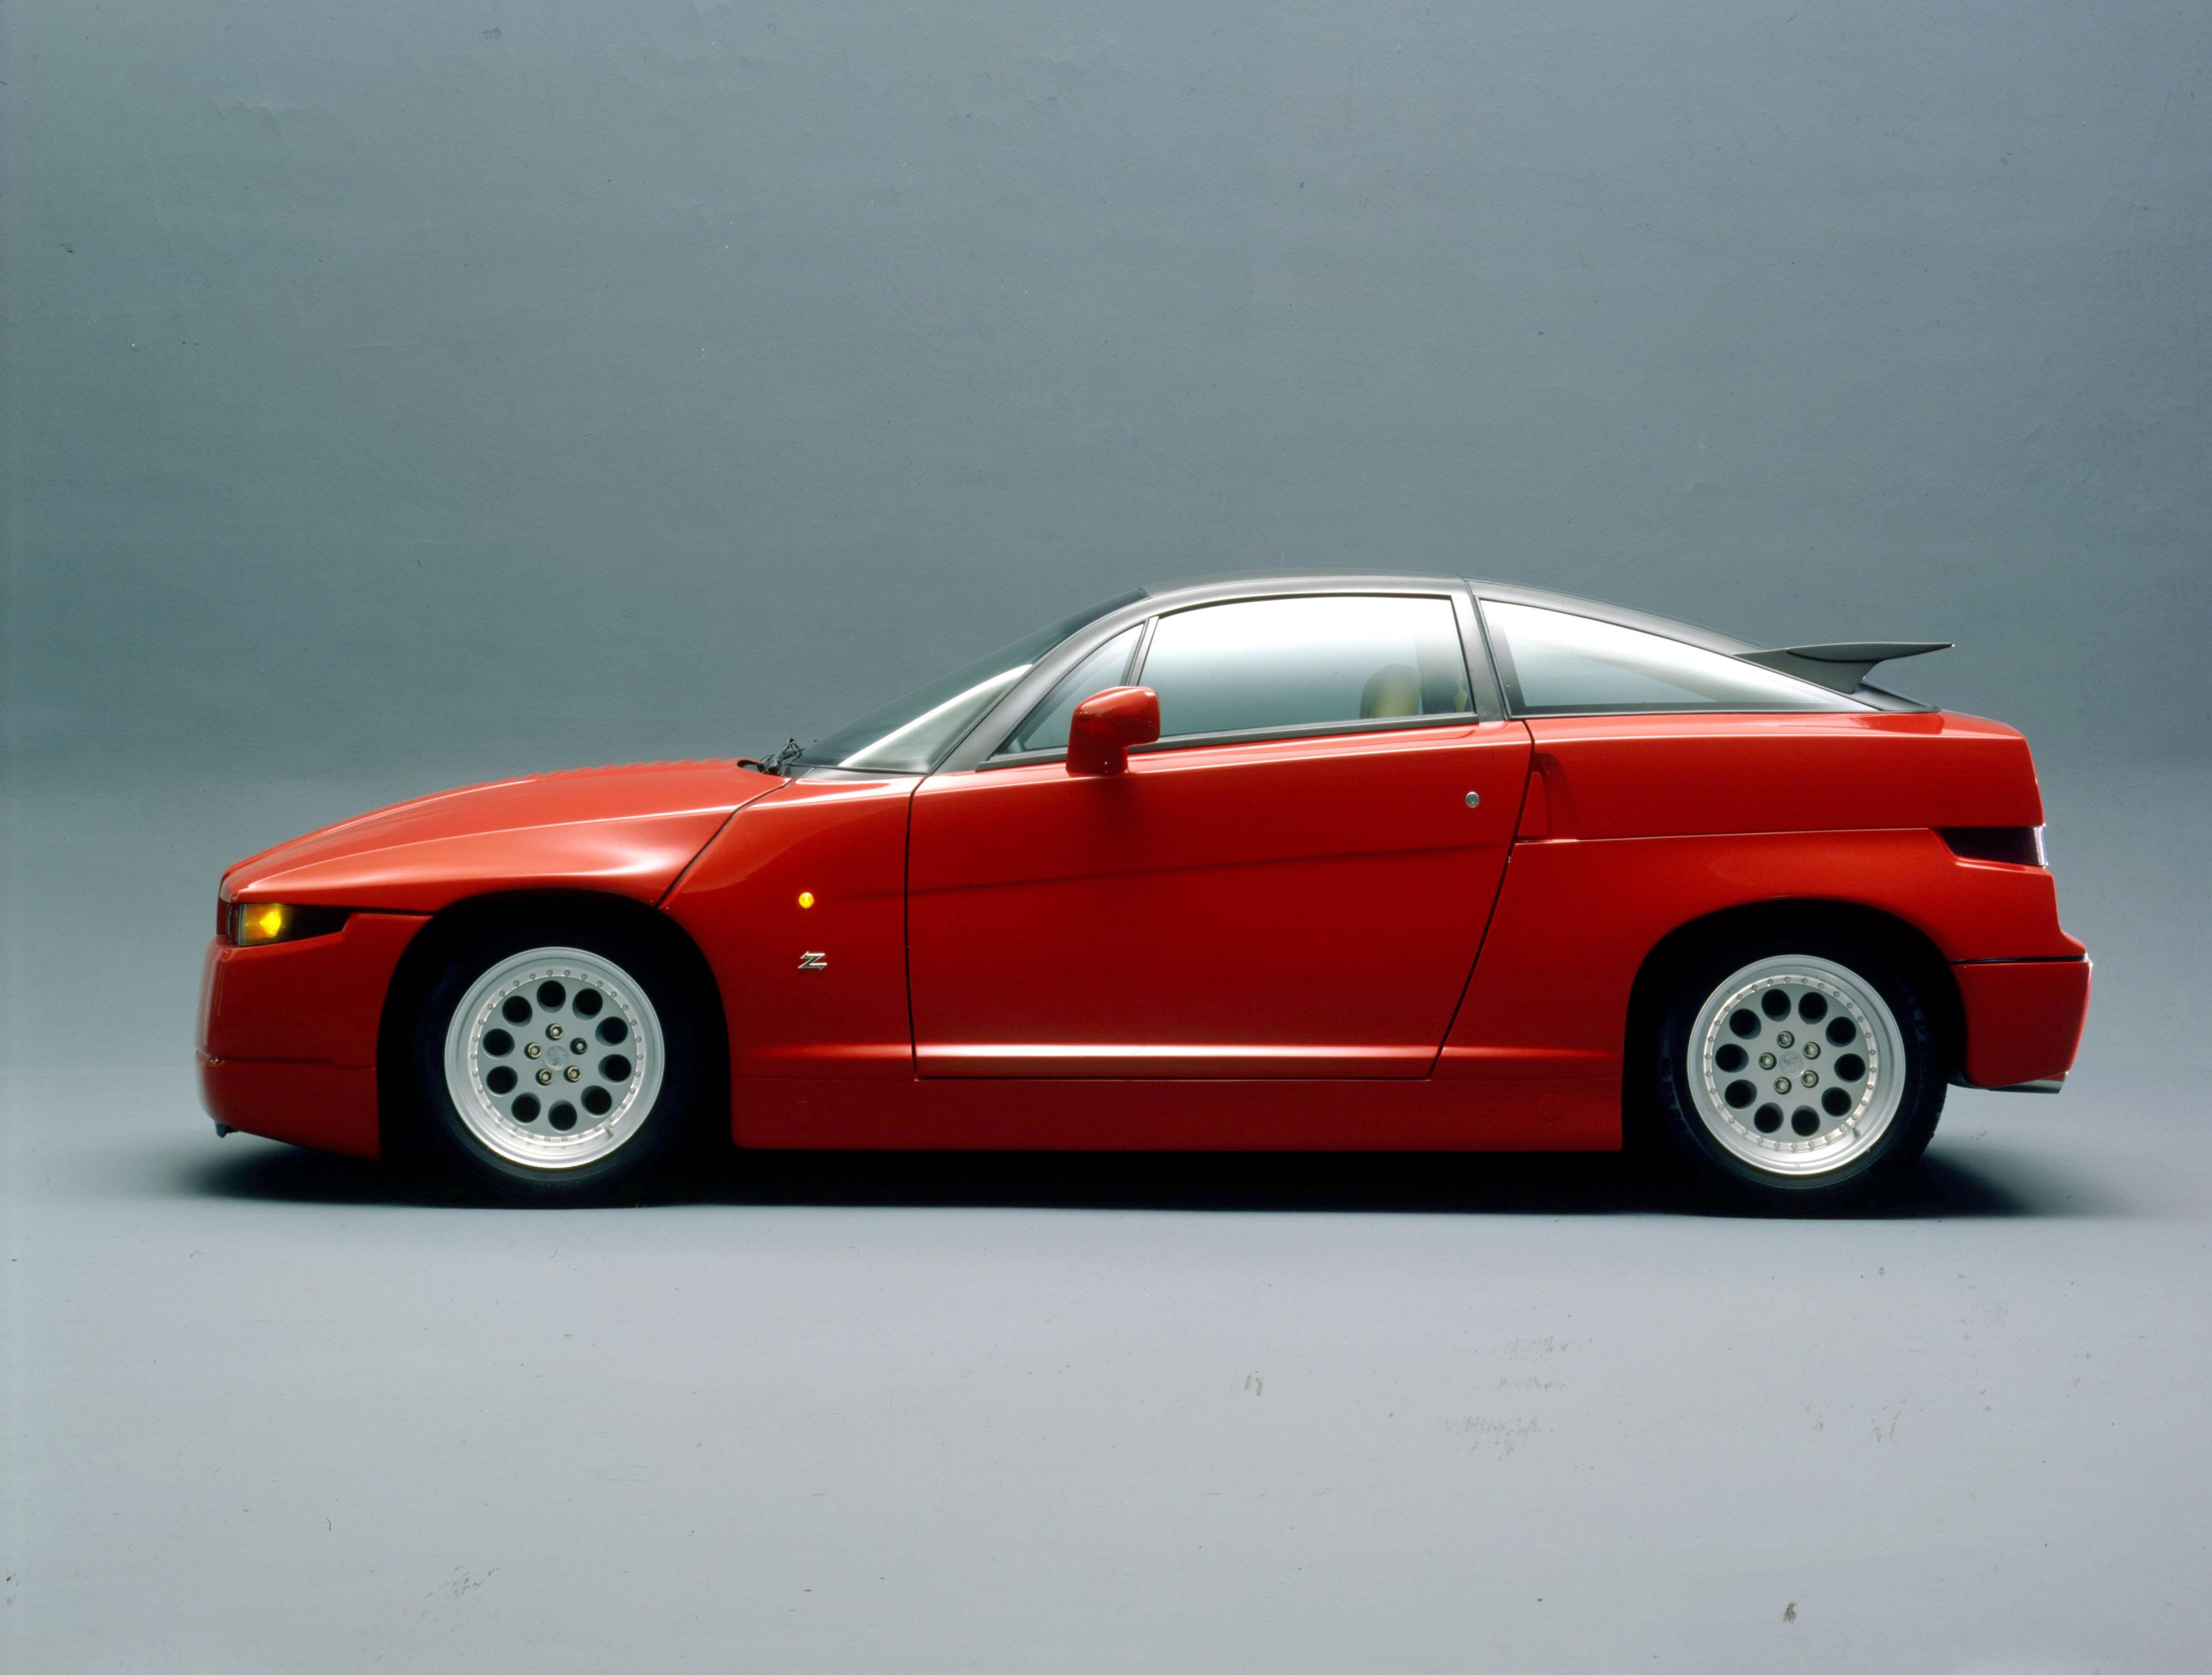 1989 Alfa Romeo SZ Reloaded by Creators